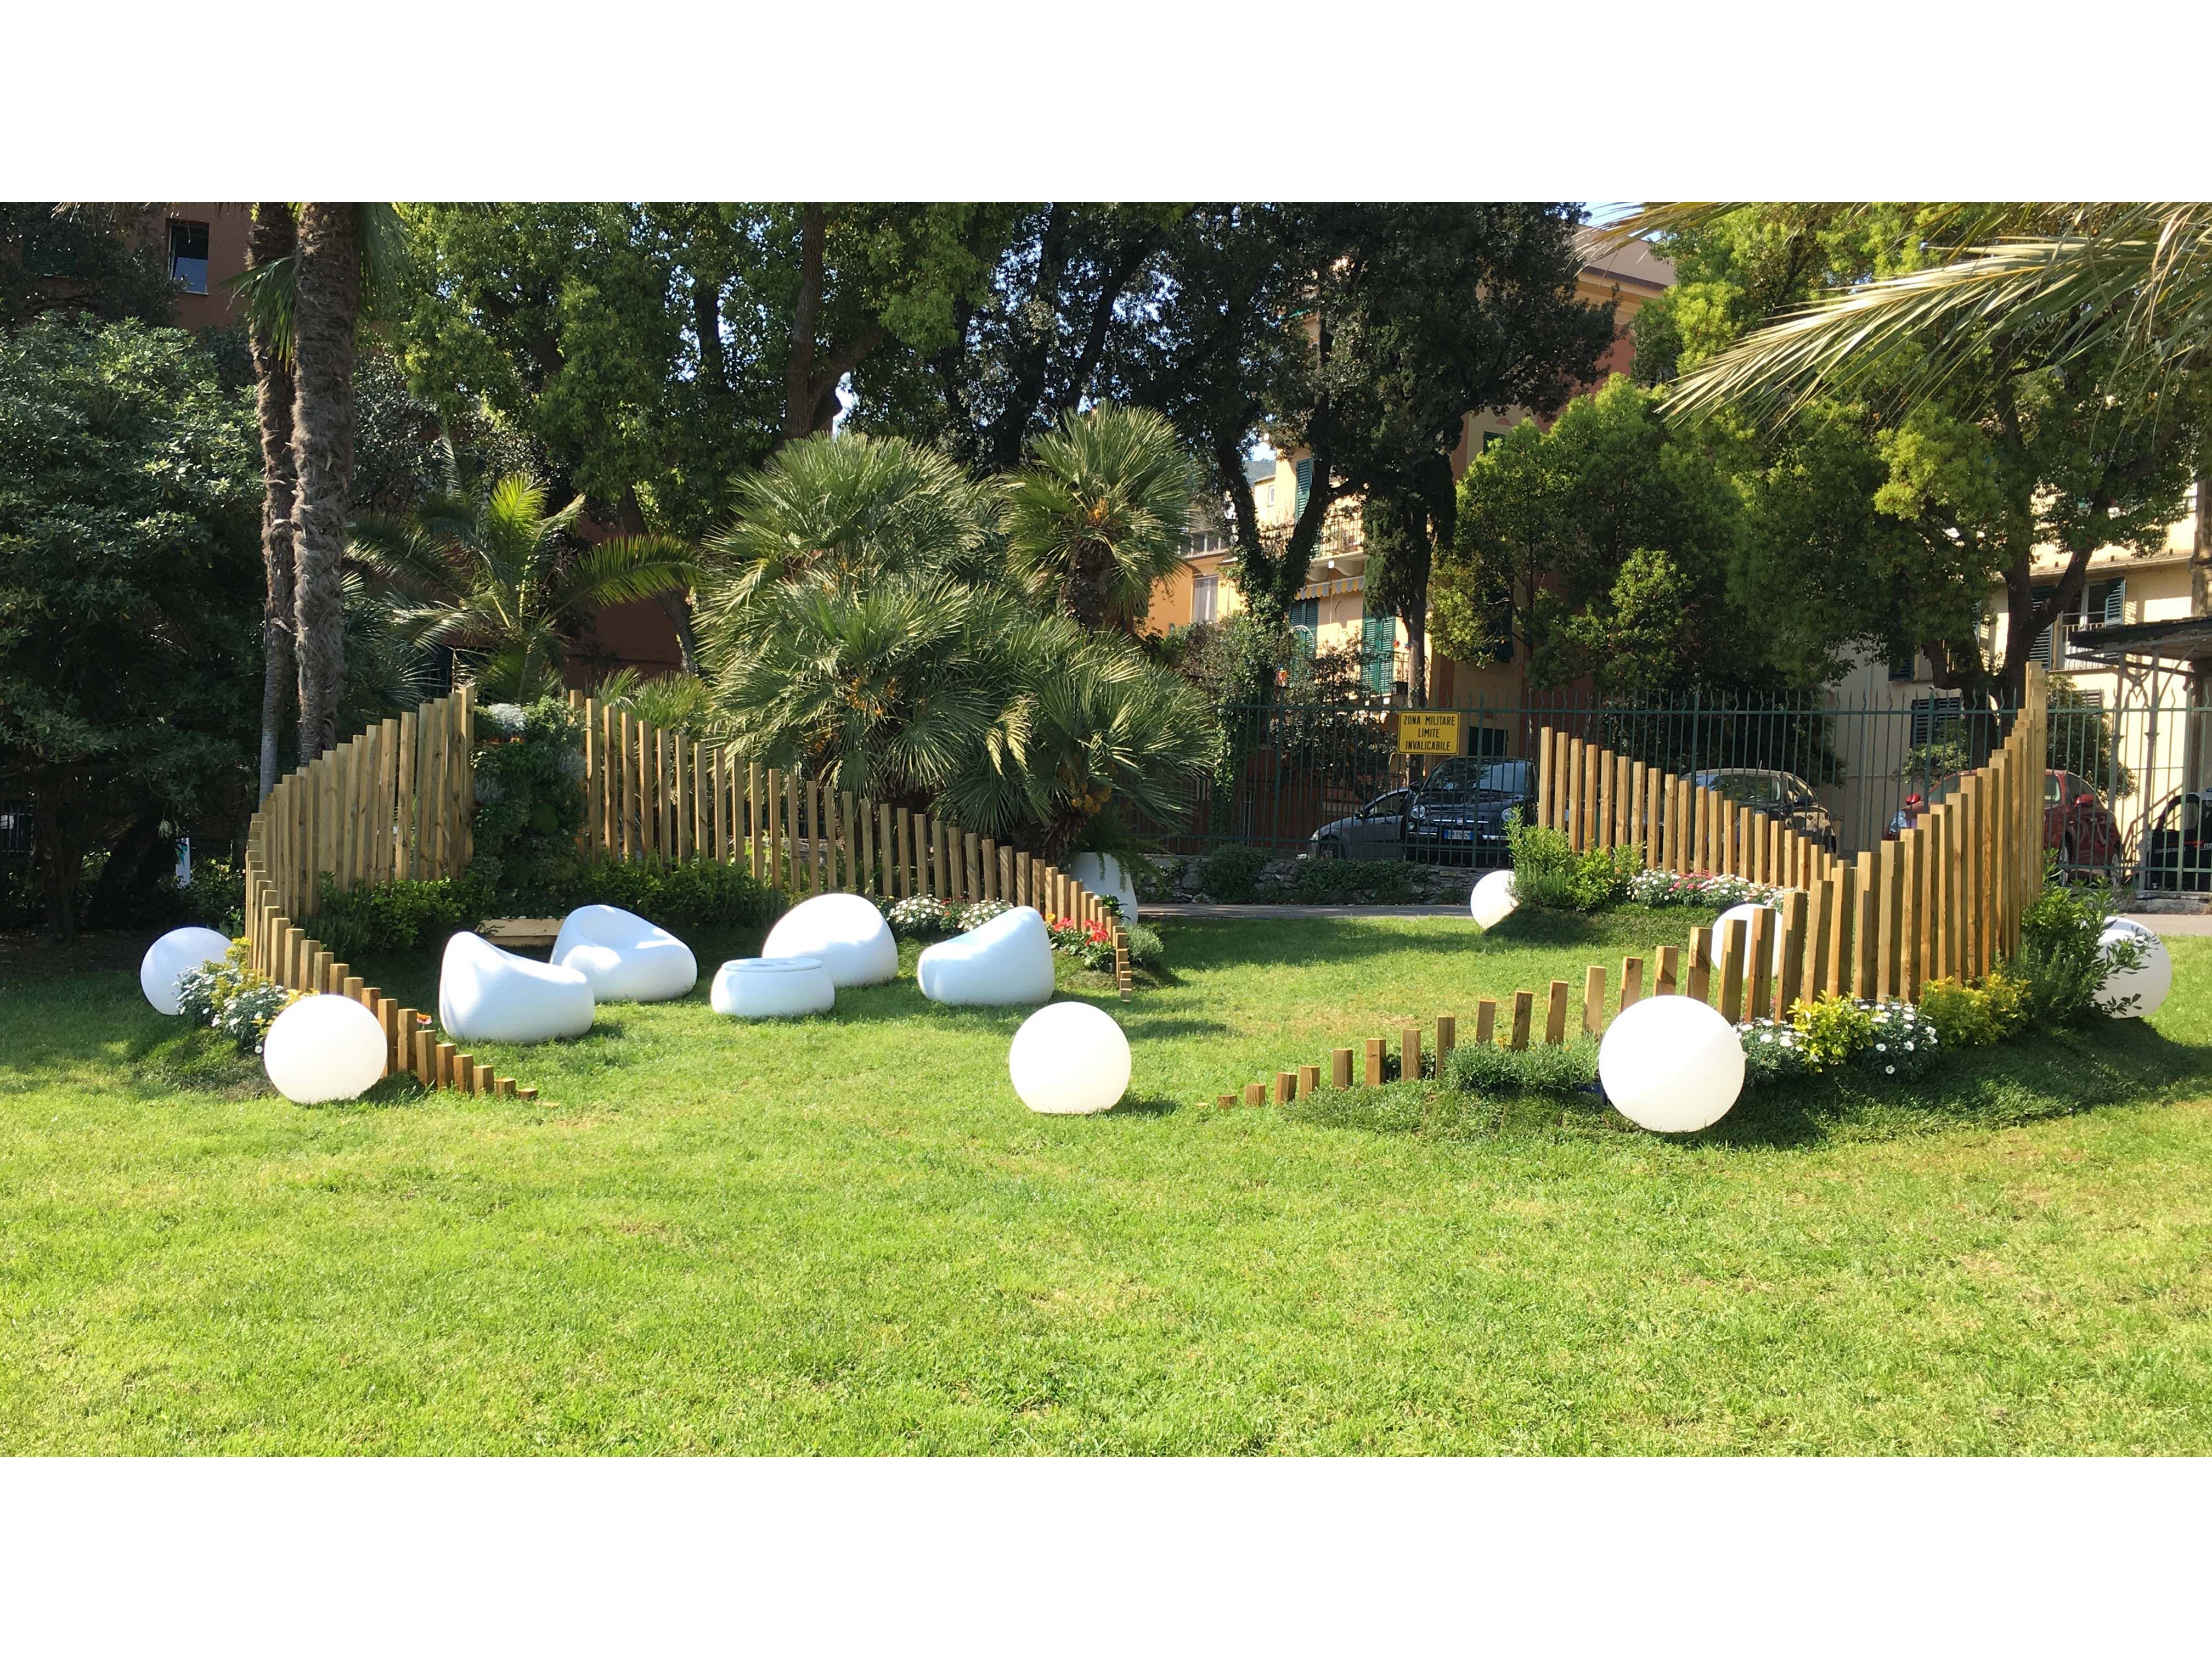 Finalmente è iniziata Euroflora 2018! #euroflora #giardino #garden ...